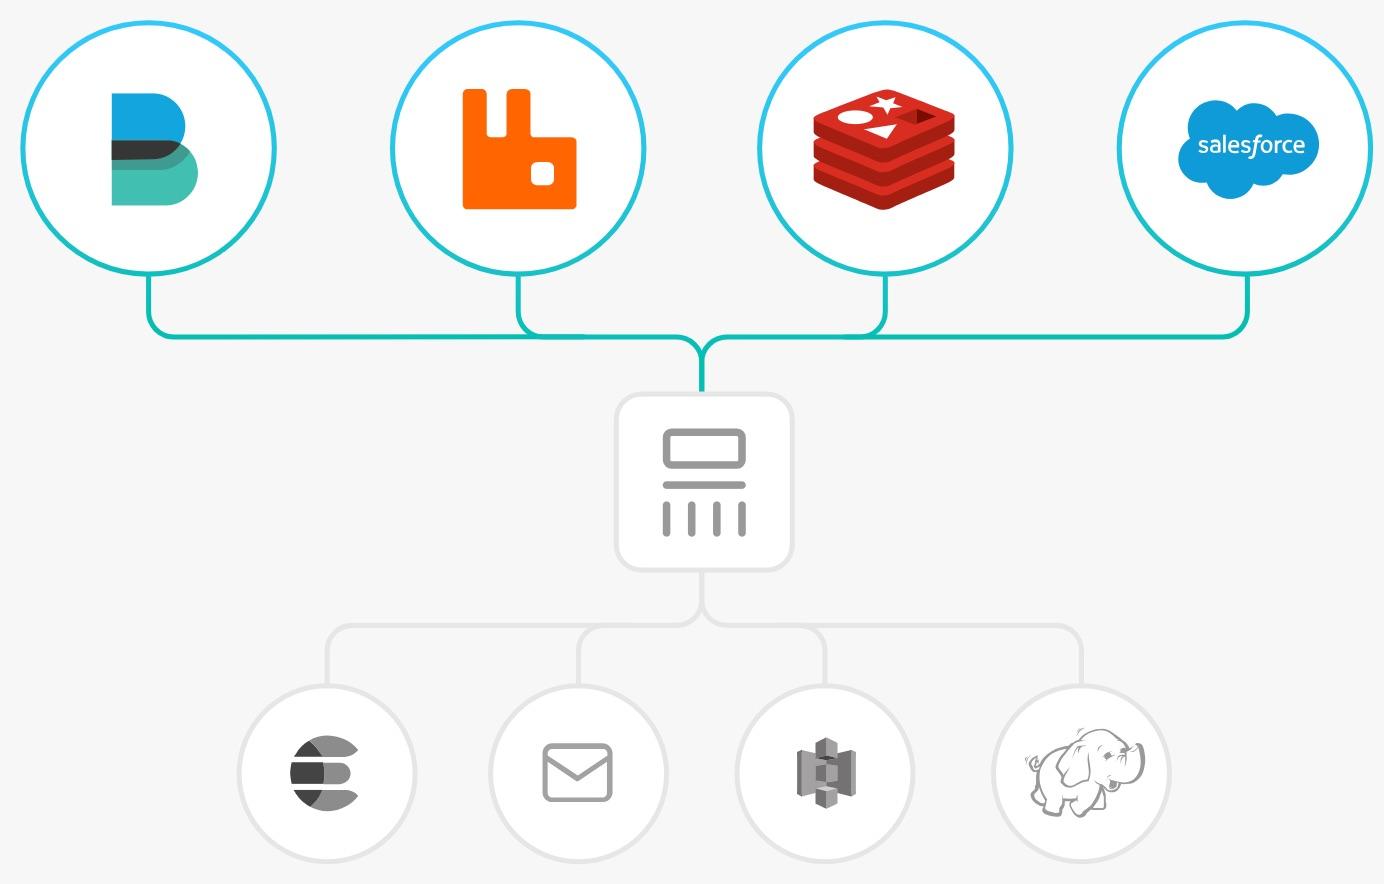 logstash-input-elk-stack